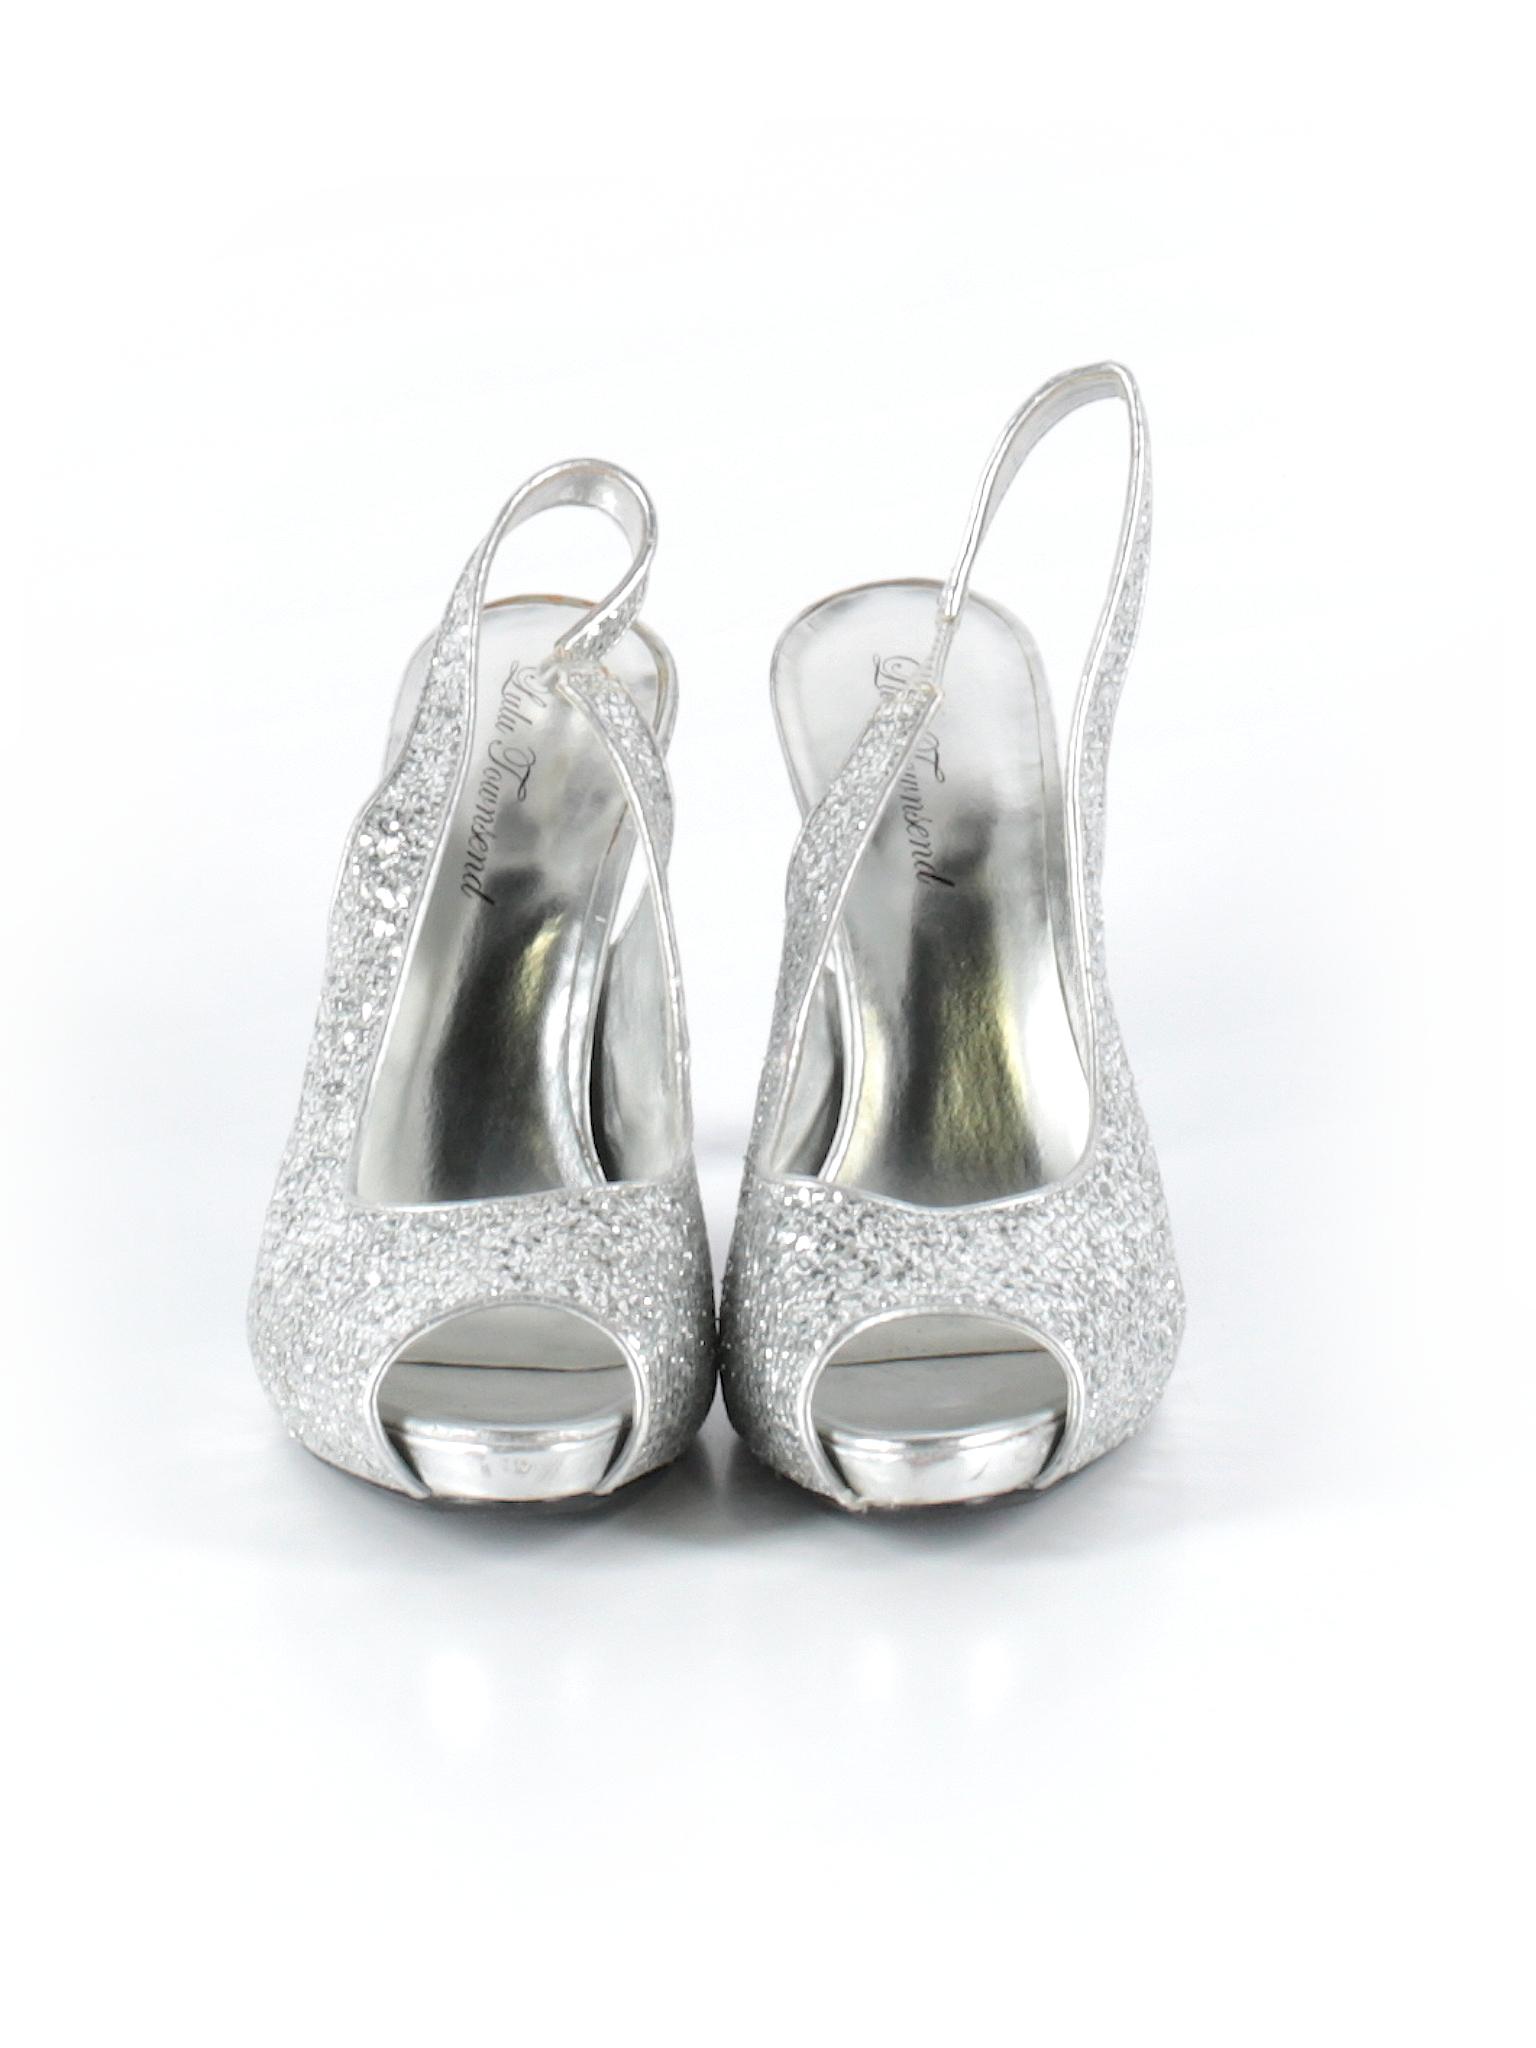 0db682cf977 Lulu Townsend Solid Silver Heels Size 9 1 2 - 76% off